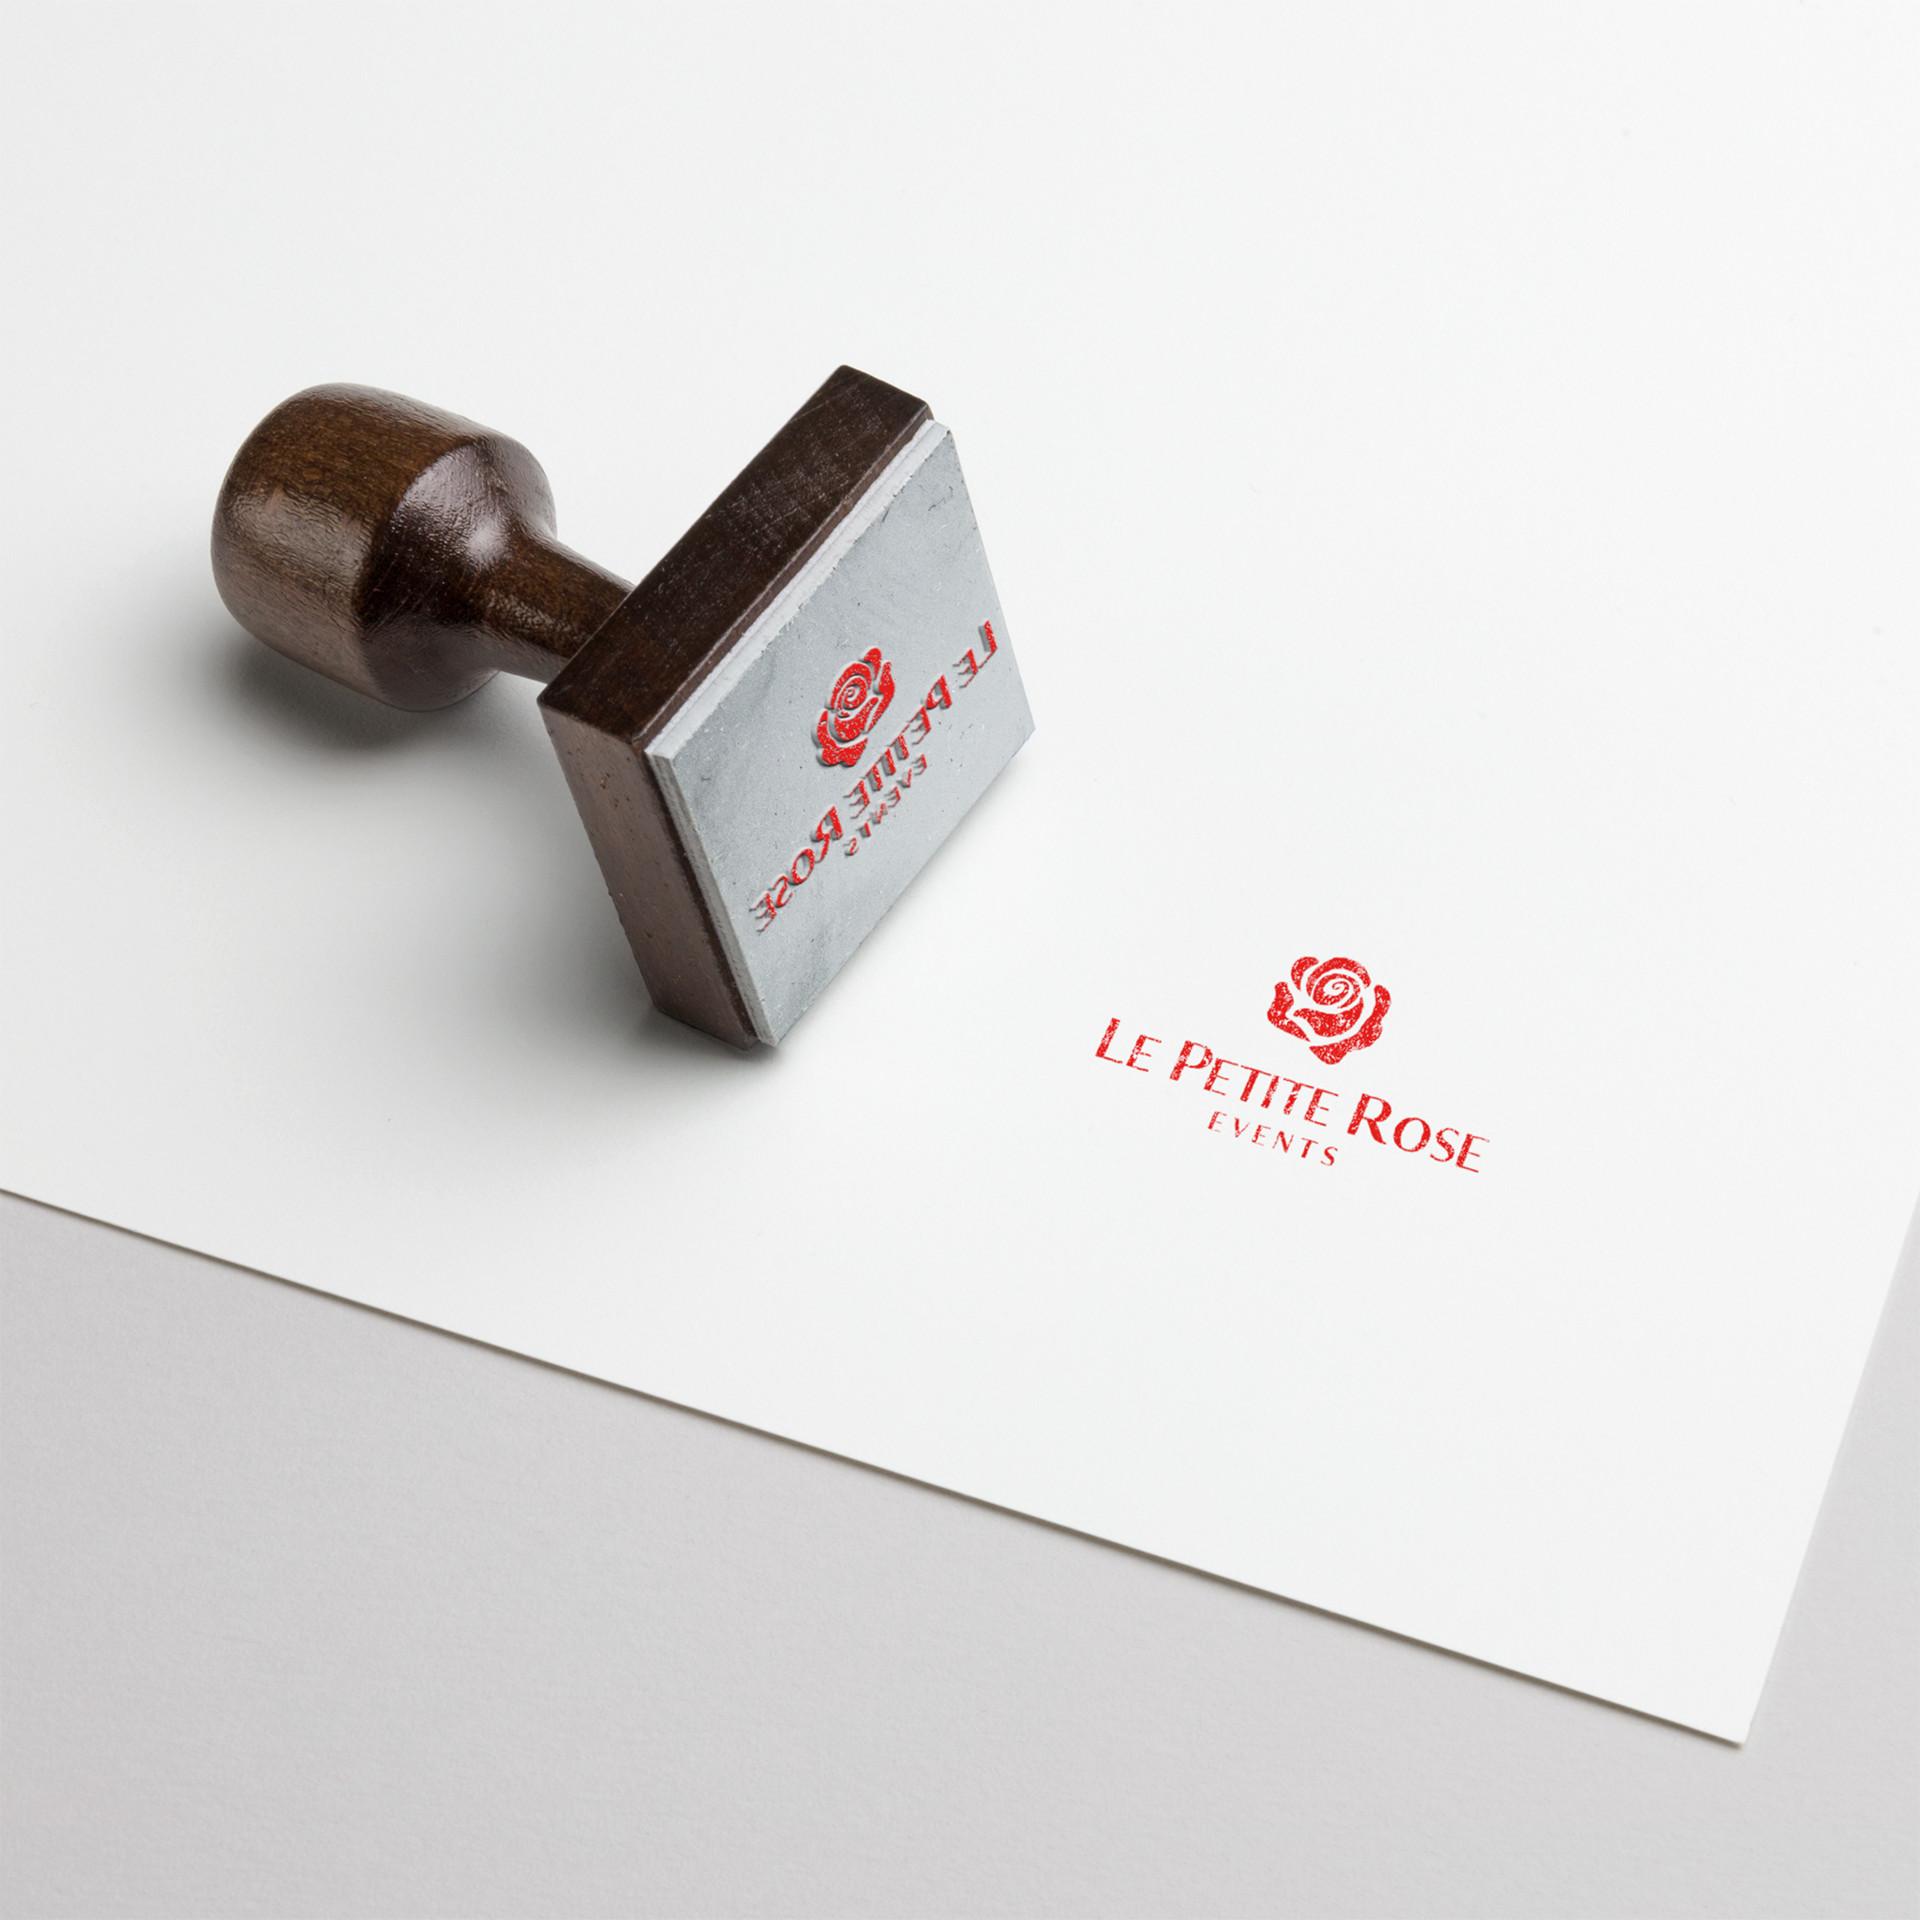 Cristian ricardi rubber stamp psd mockup11